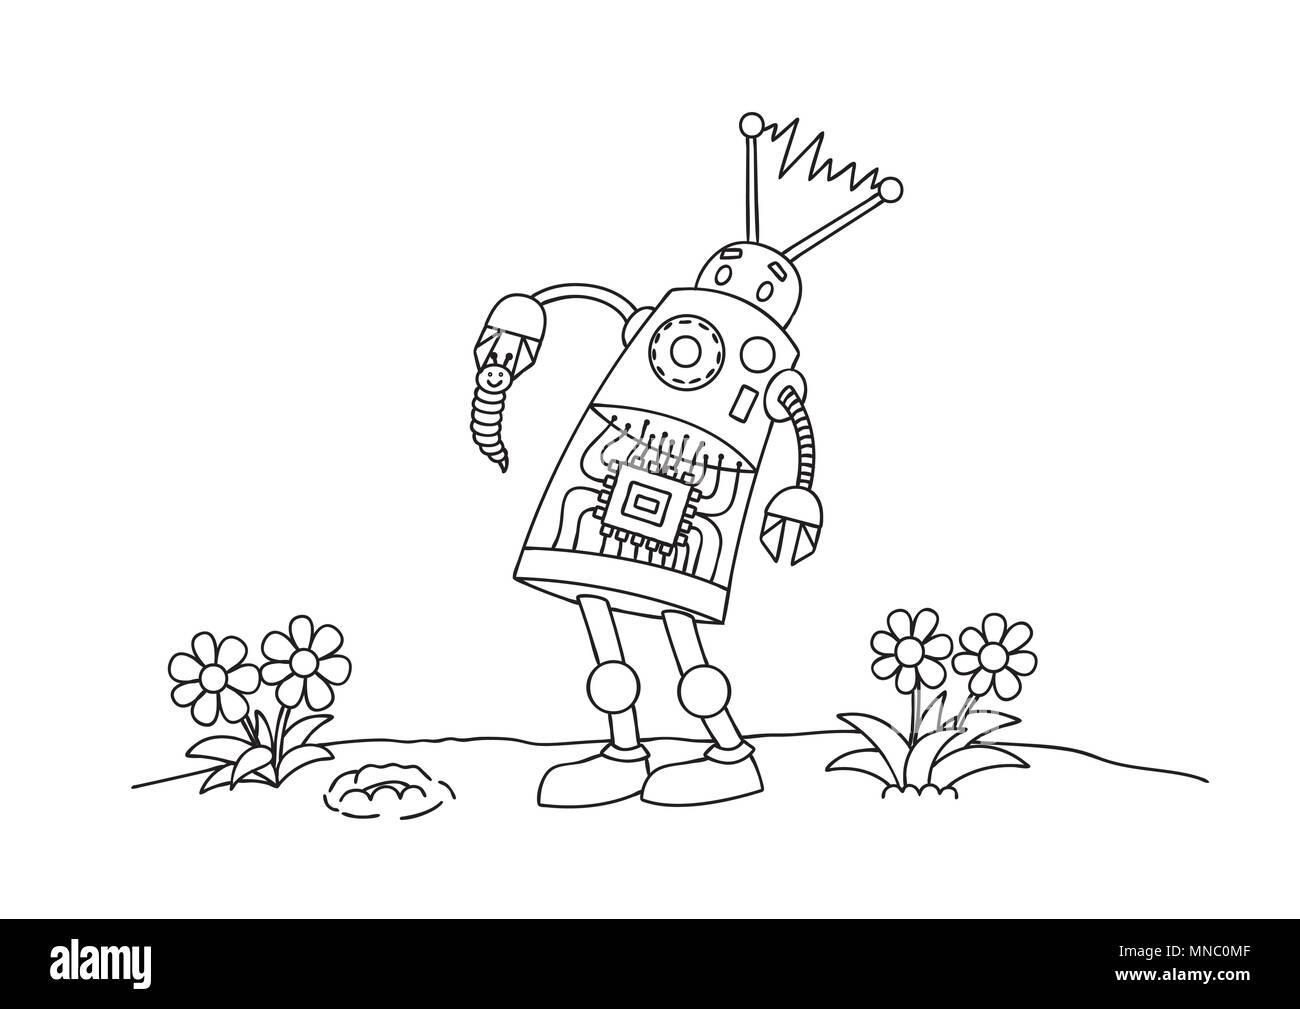 Excepcional Genial Robot Para Colorear Composición - Enmarcado Para ...